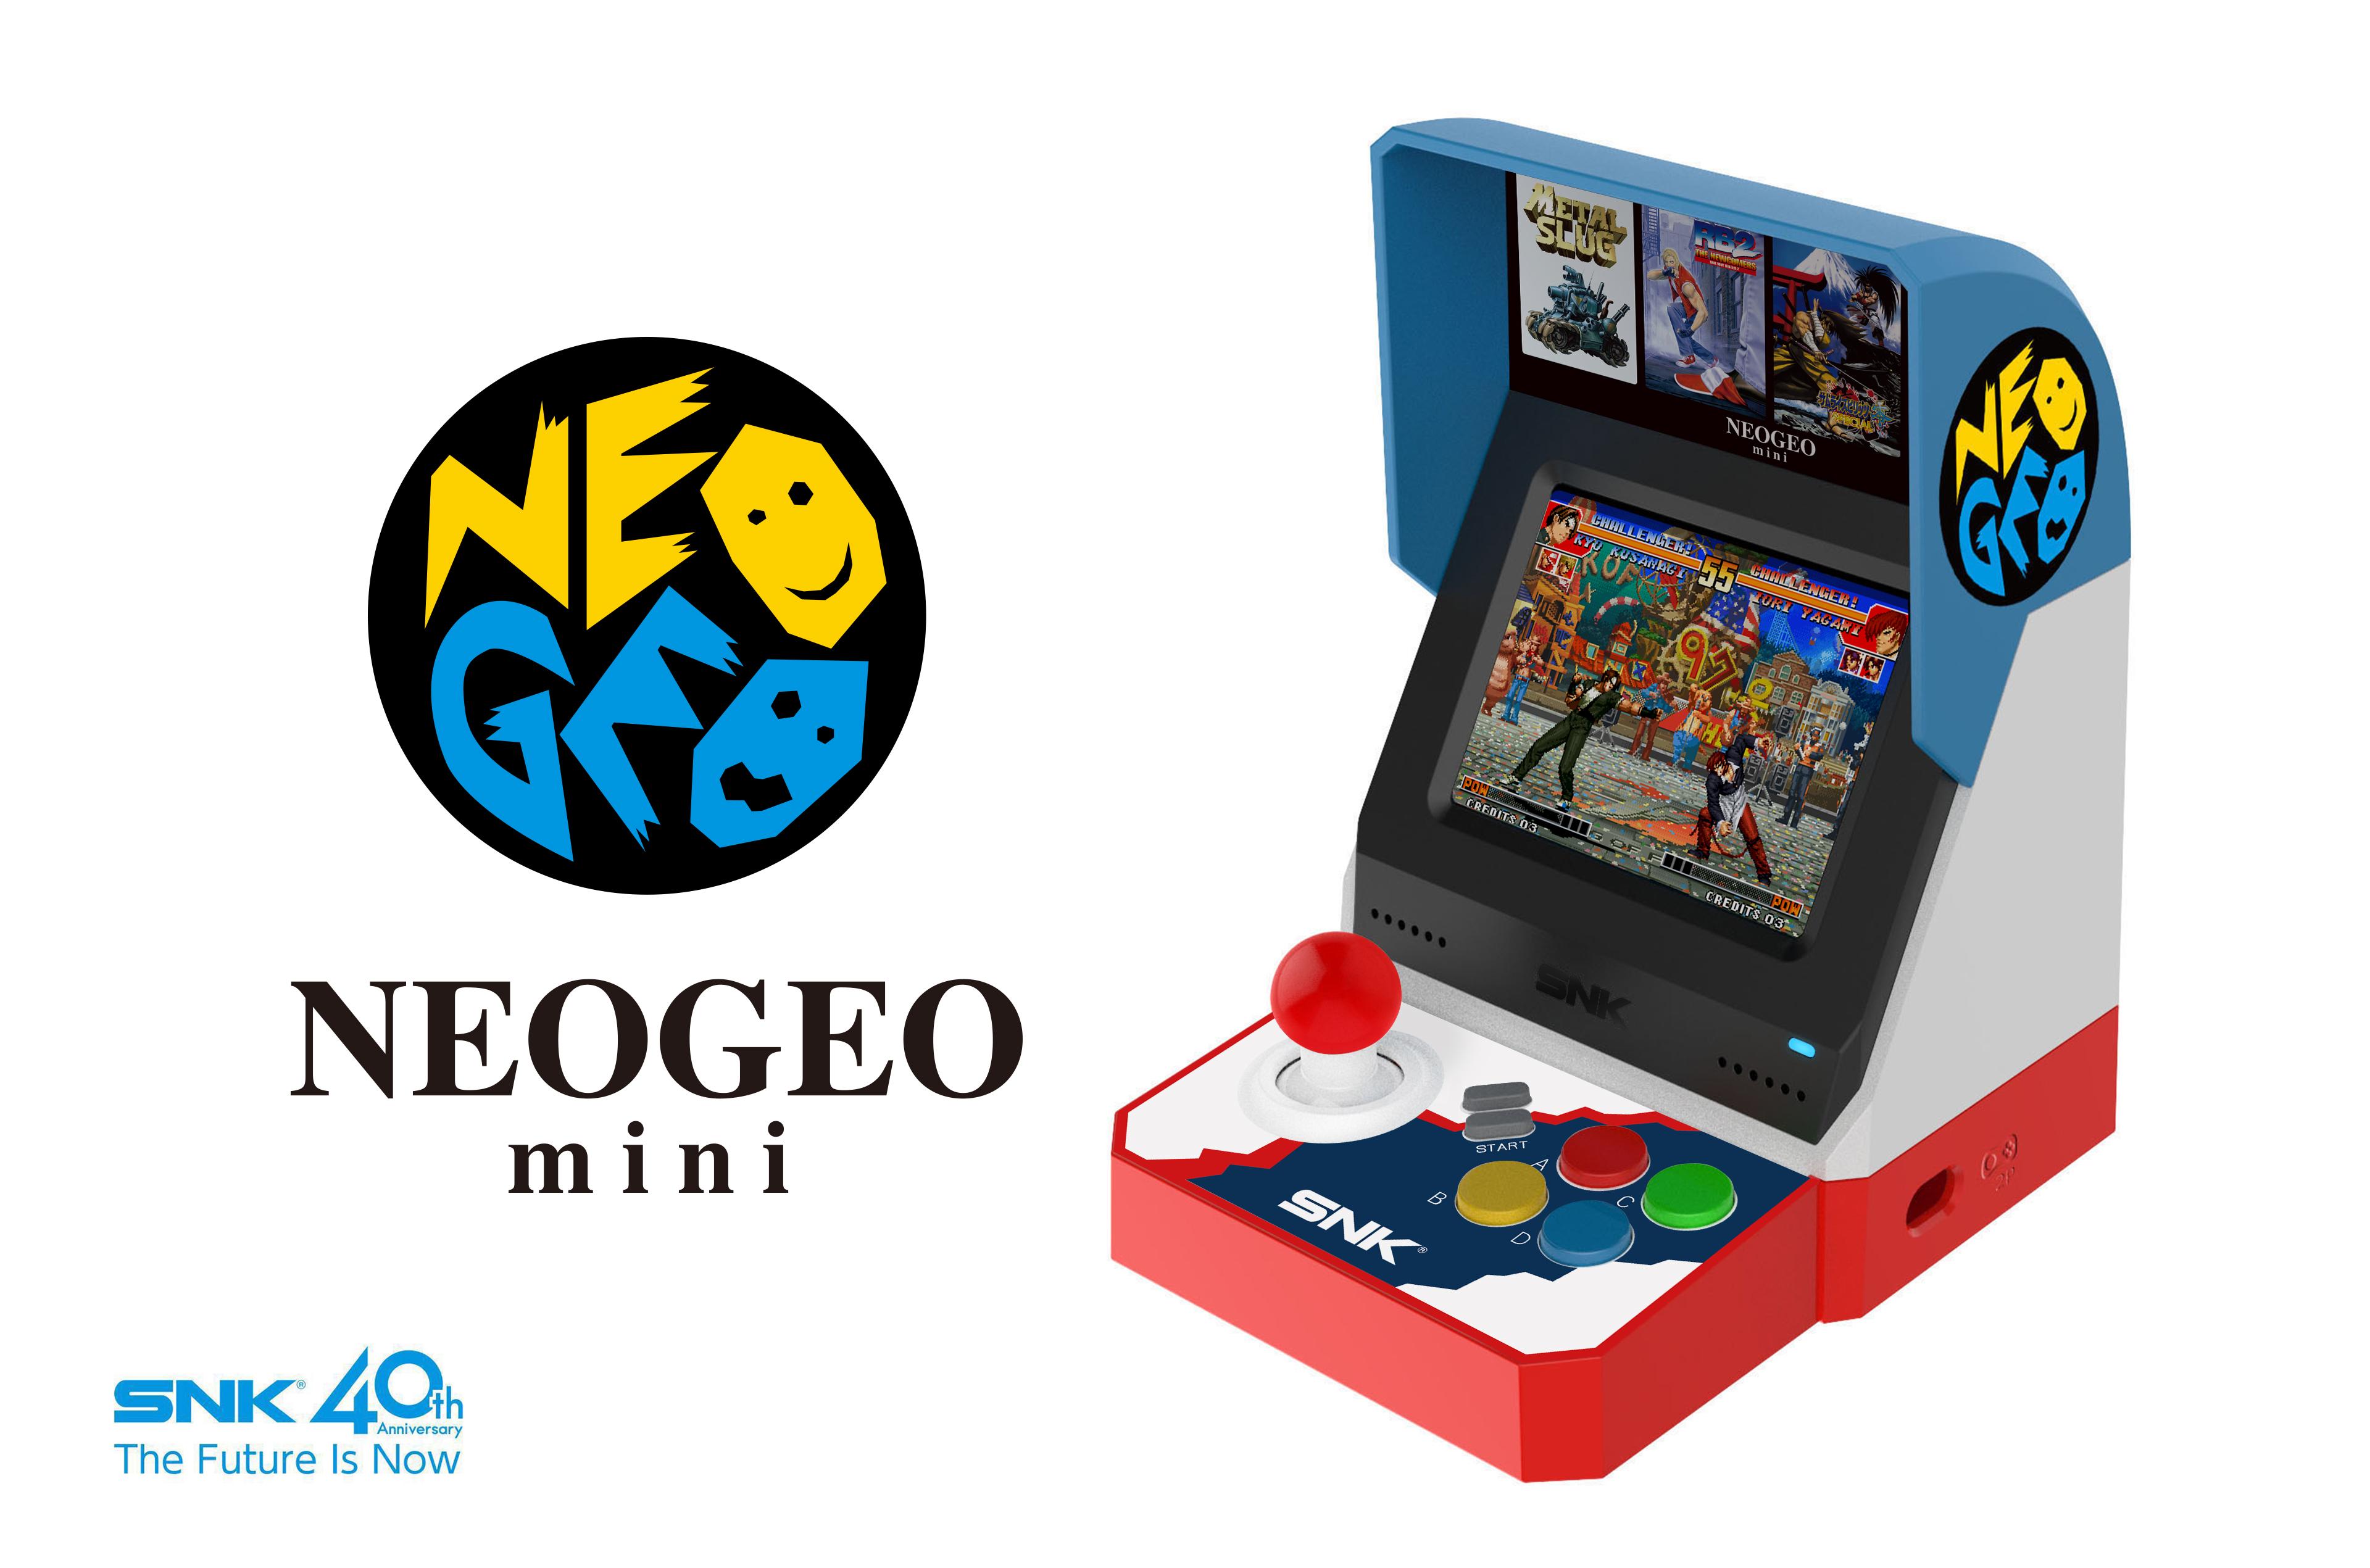 「NEOGEO mini」SNKブランド40周年を記念したゲーム機が登場!